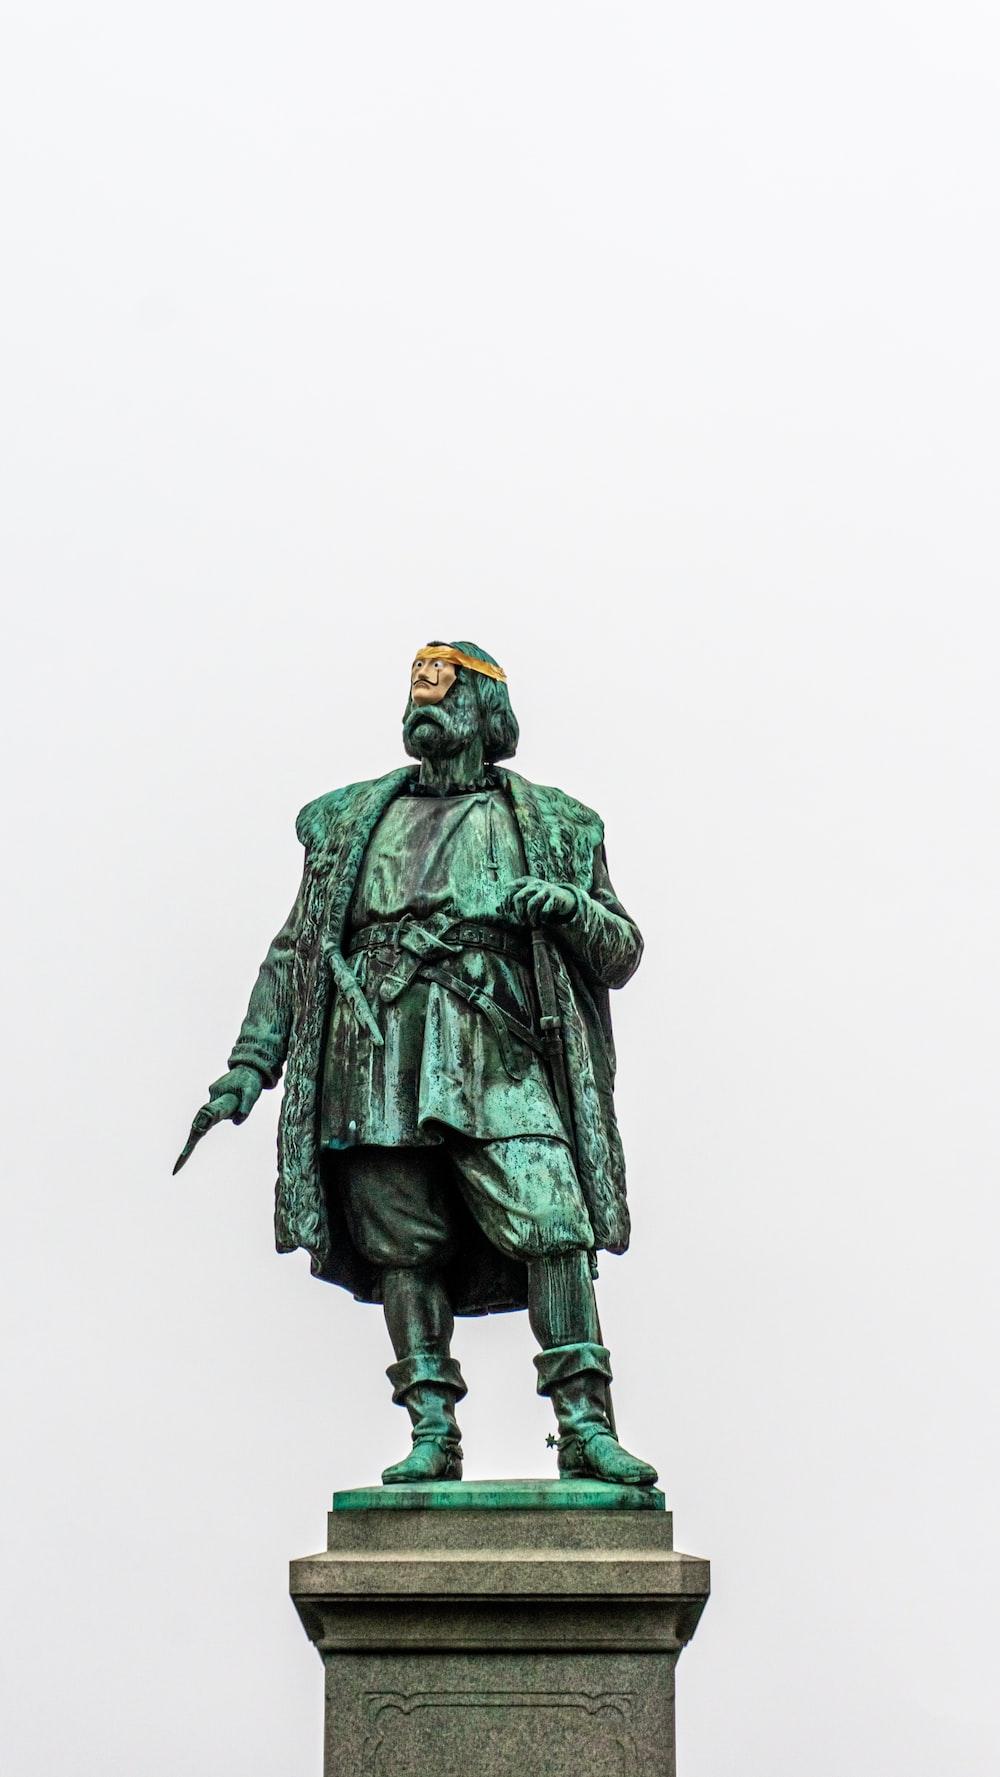 man in green coat statue